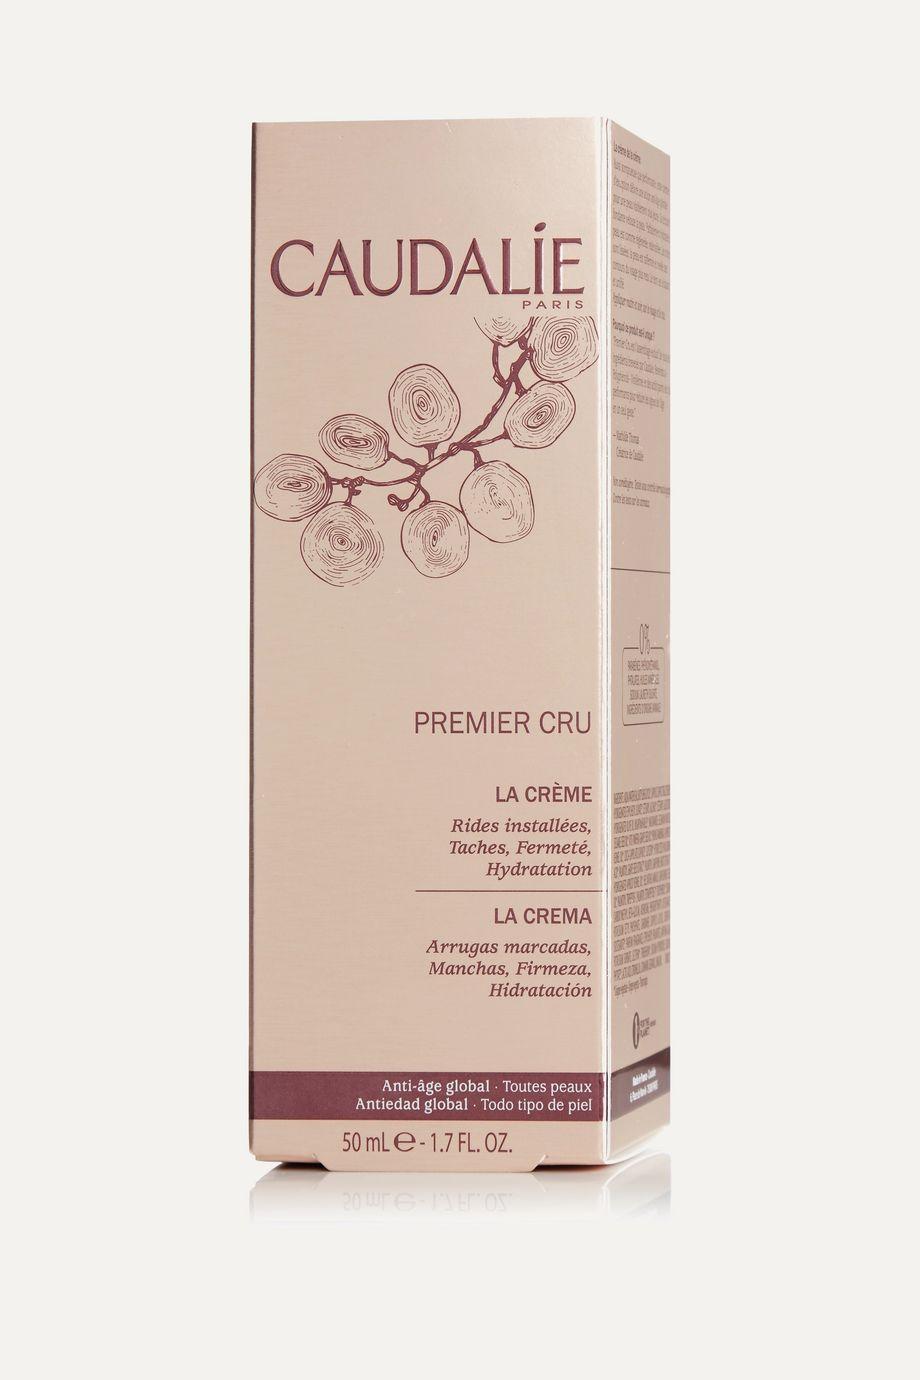 Caudalie Premier Cru The Cream, 50ml